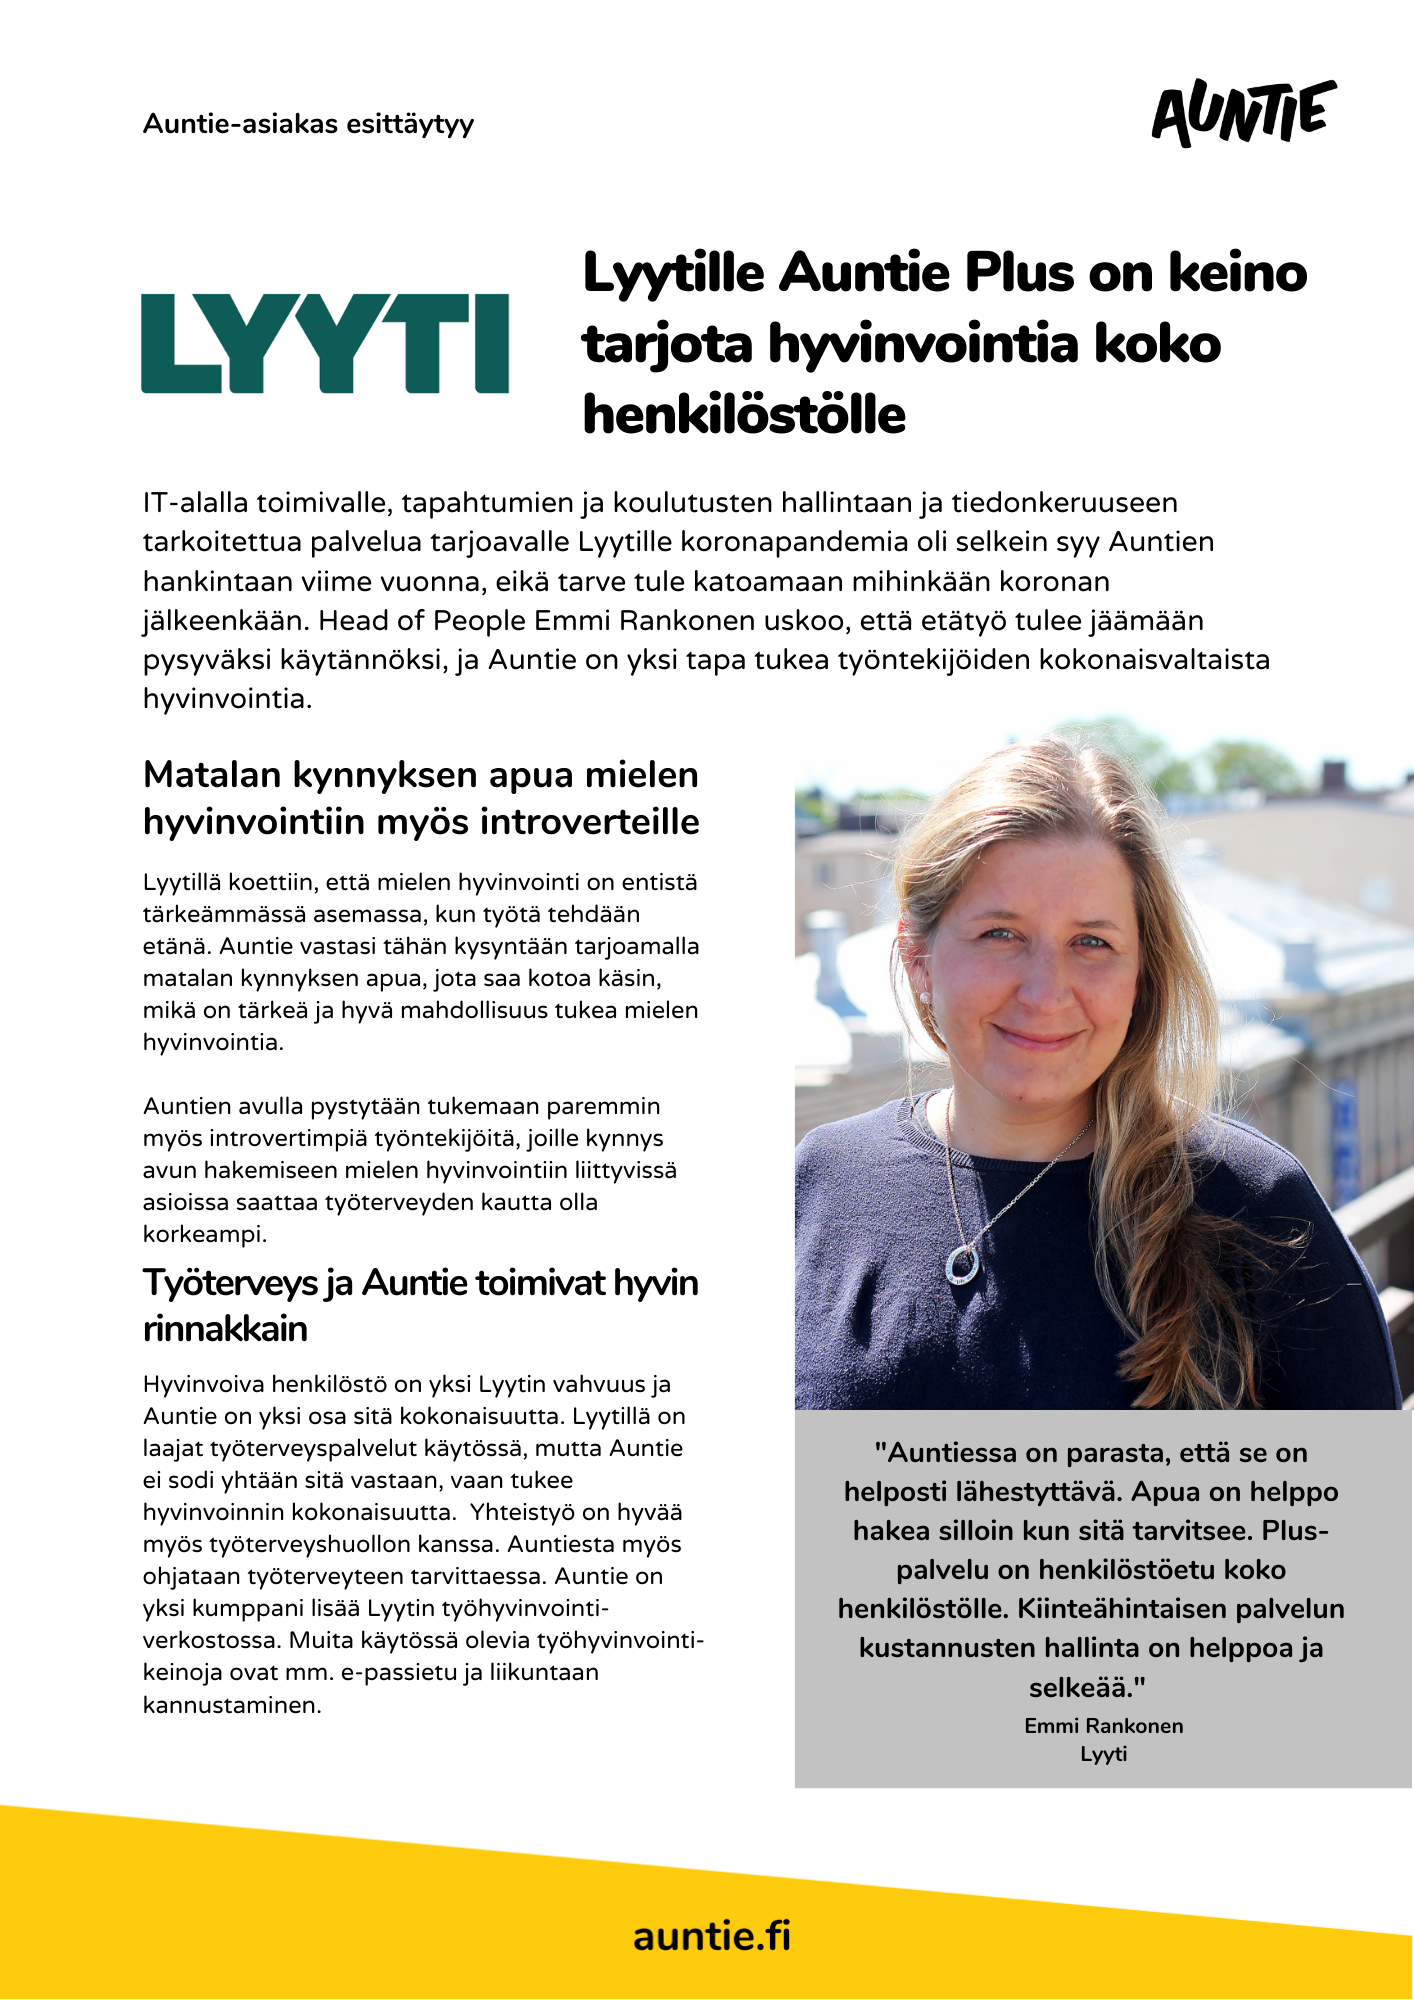 Lyyti - Auntie case study